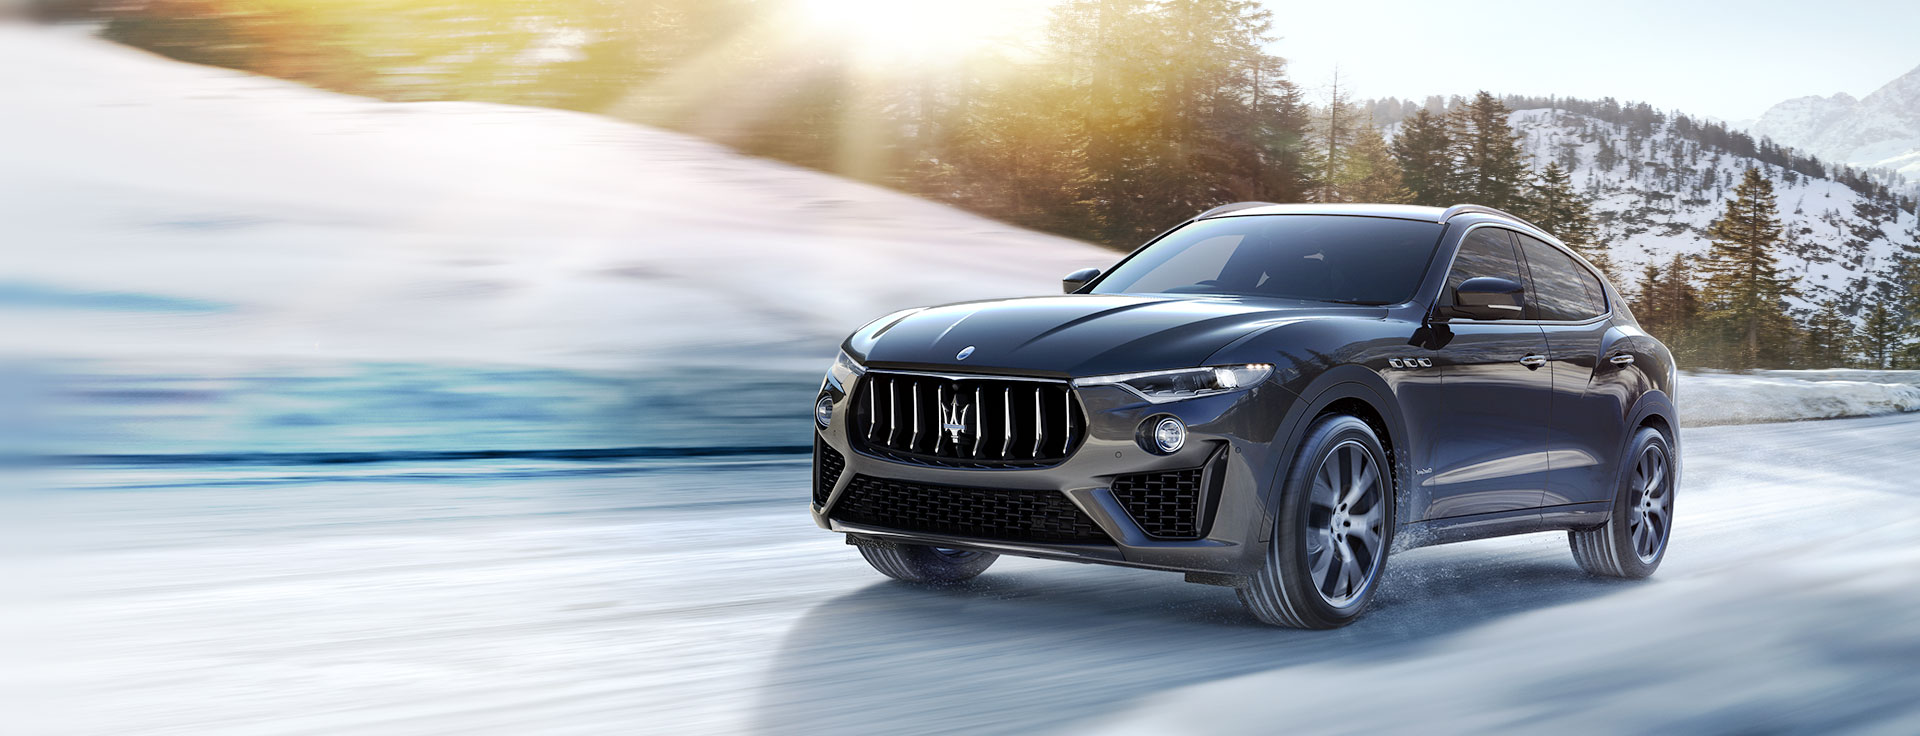 Maserati - Maserati and Pirelli, always together on both track and road